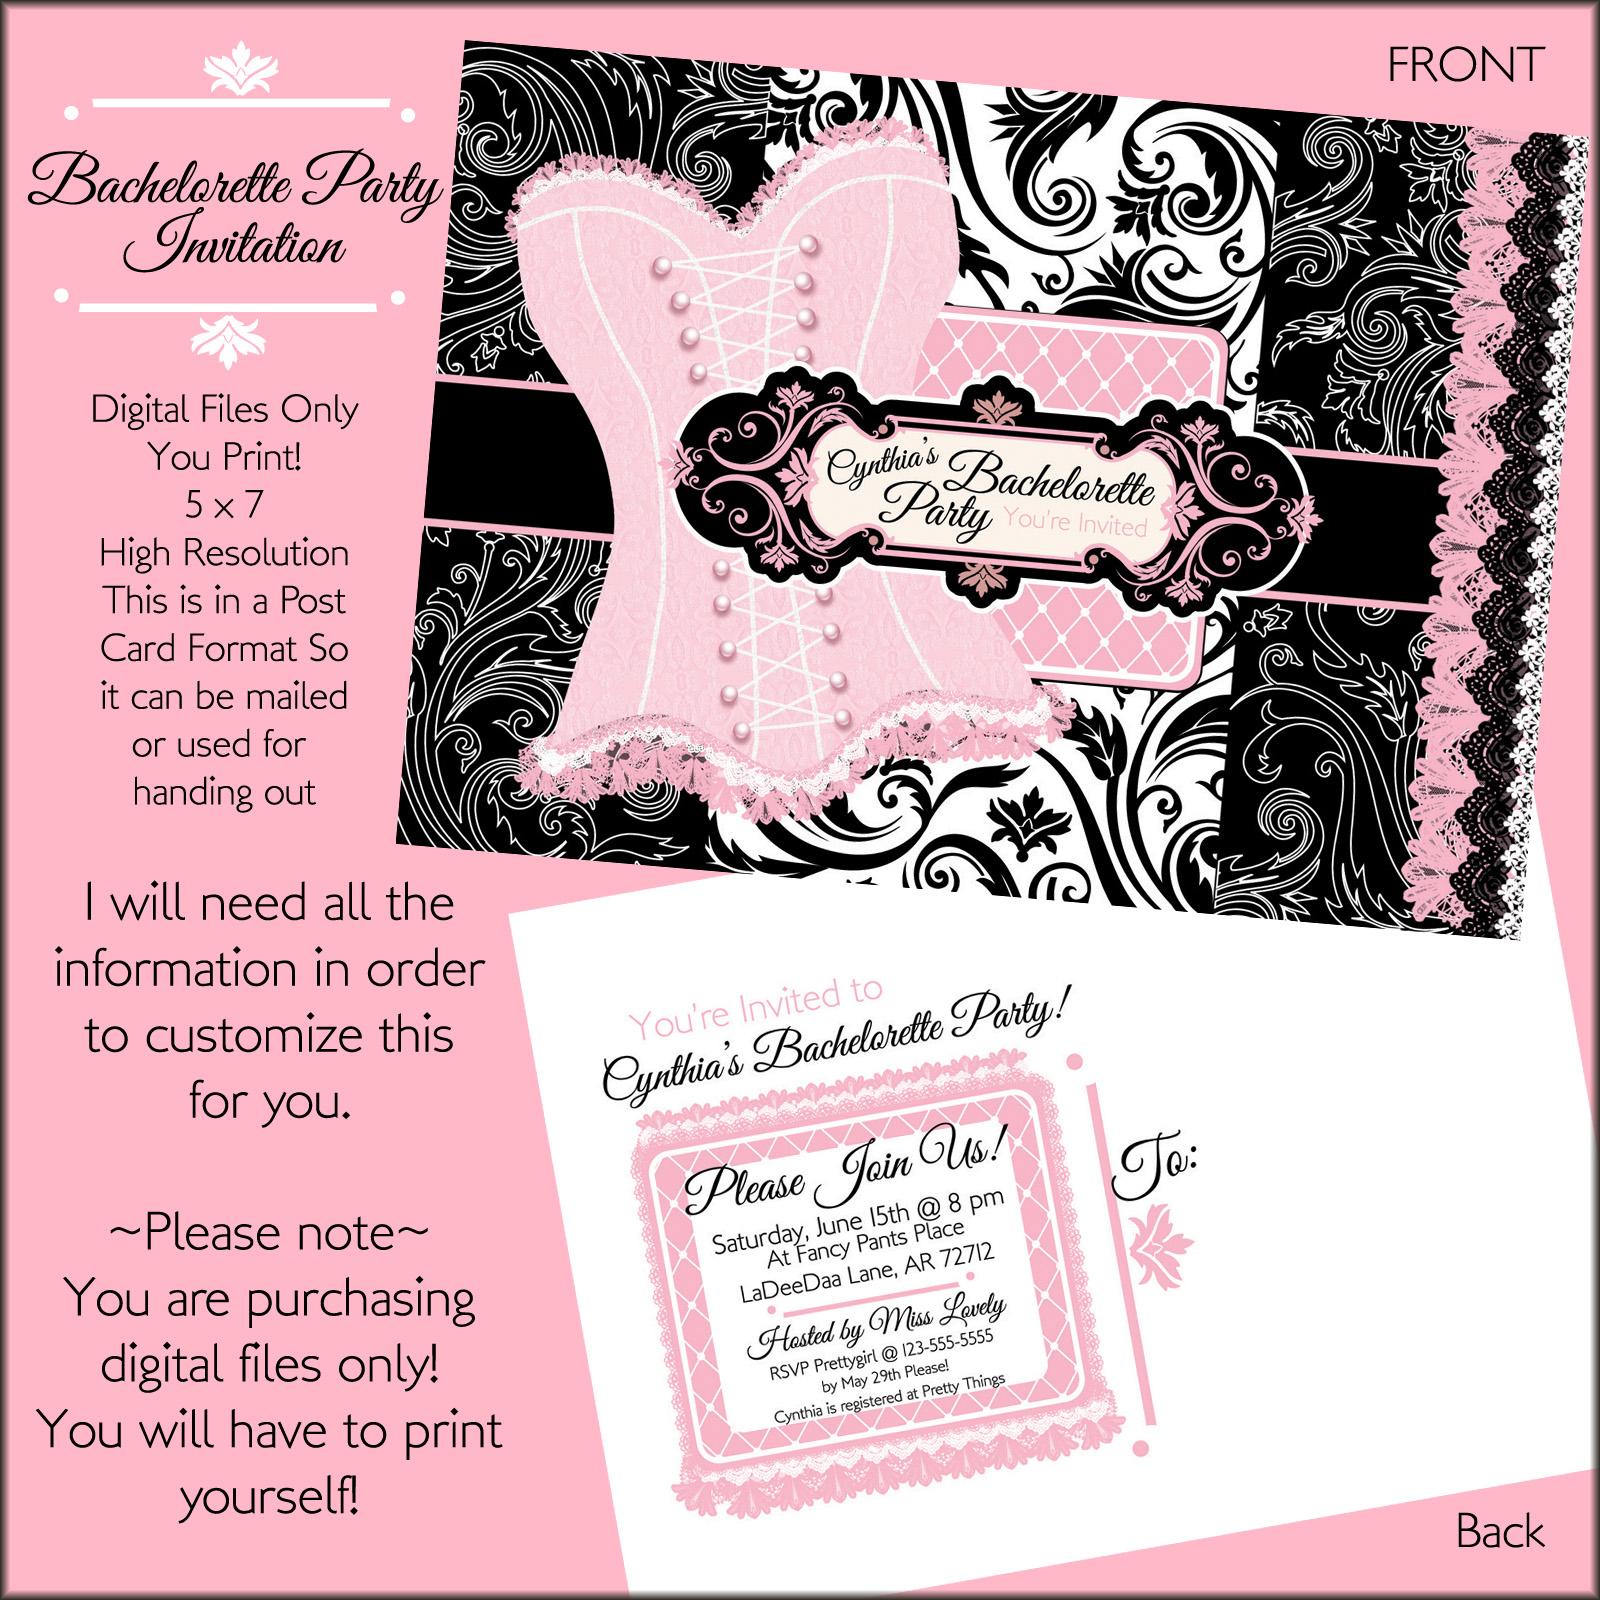 Tea Party Bridal Shower Invitation Wording was great invitations design